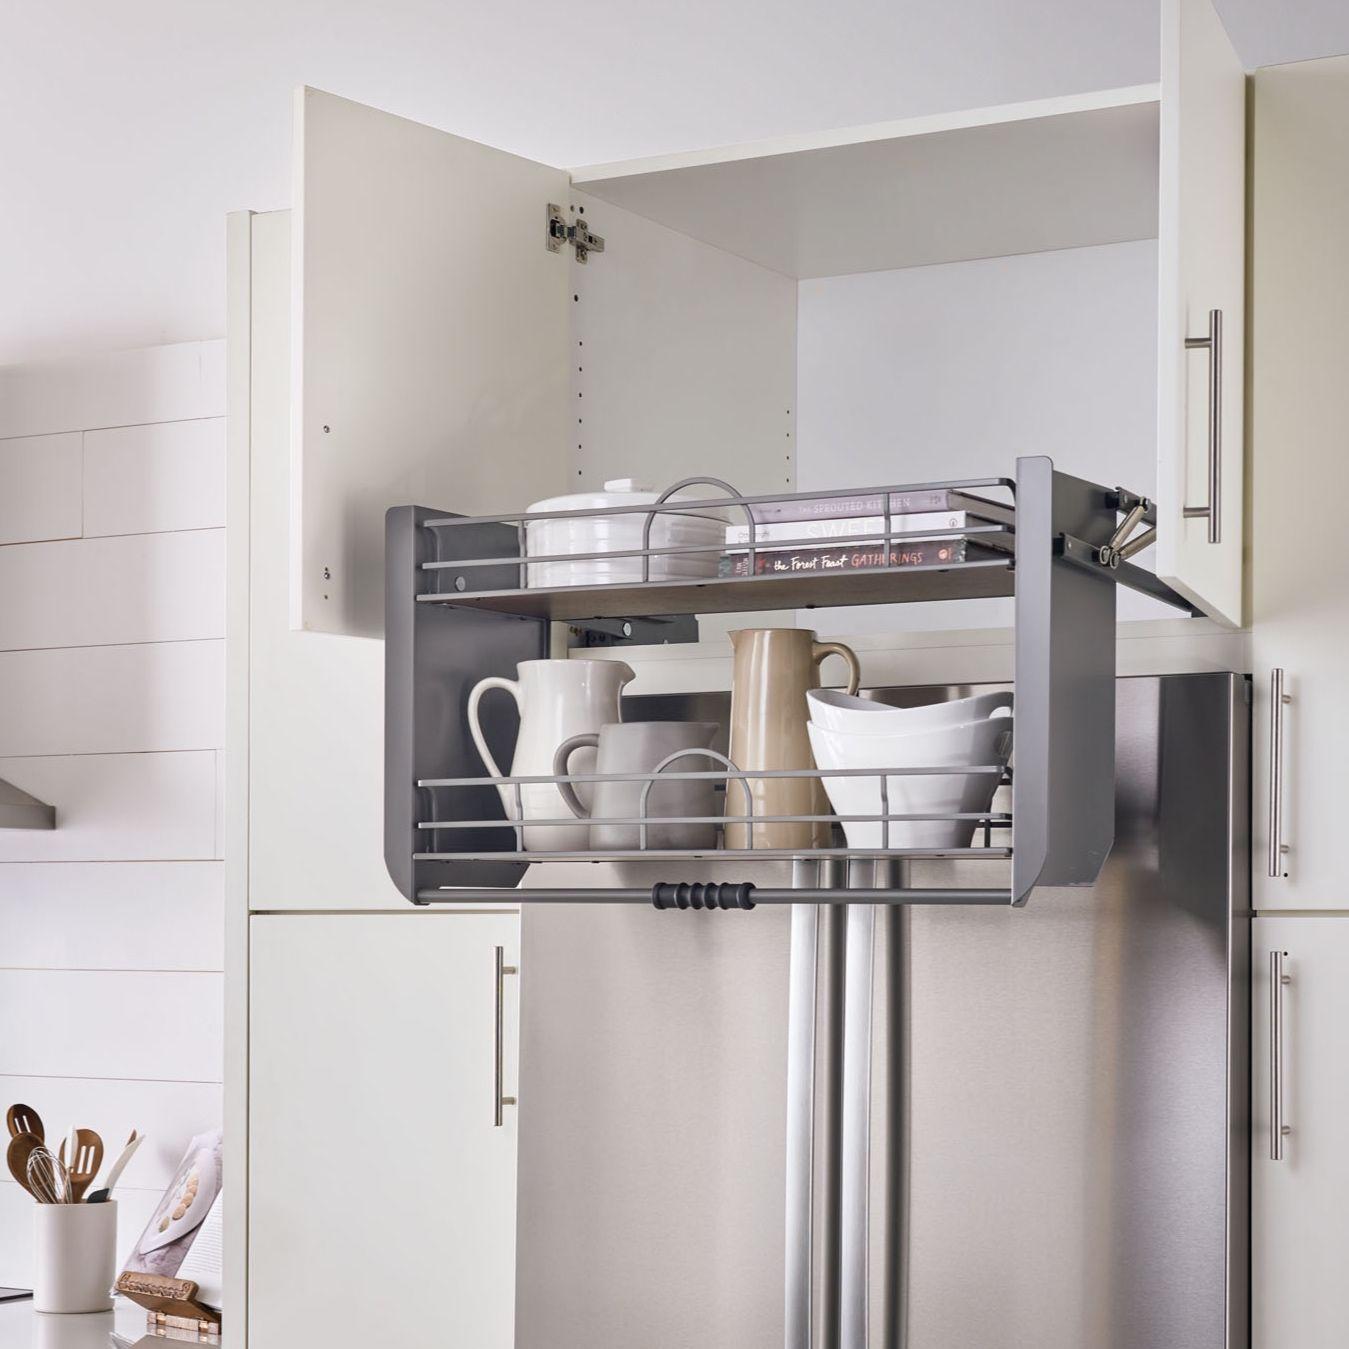 The 5pd Pulldown Shelf Conveniently Brings Hard To Reach Items Down 11 1 2 Rev A Shelf Kitchen And Bath Design Walnut Shelves